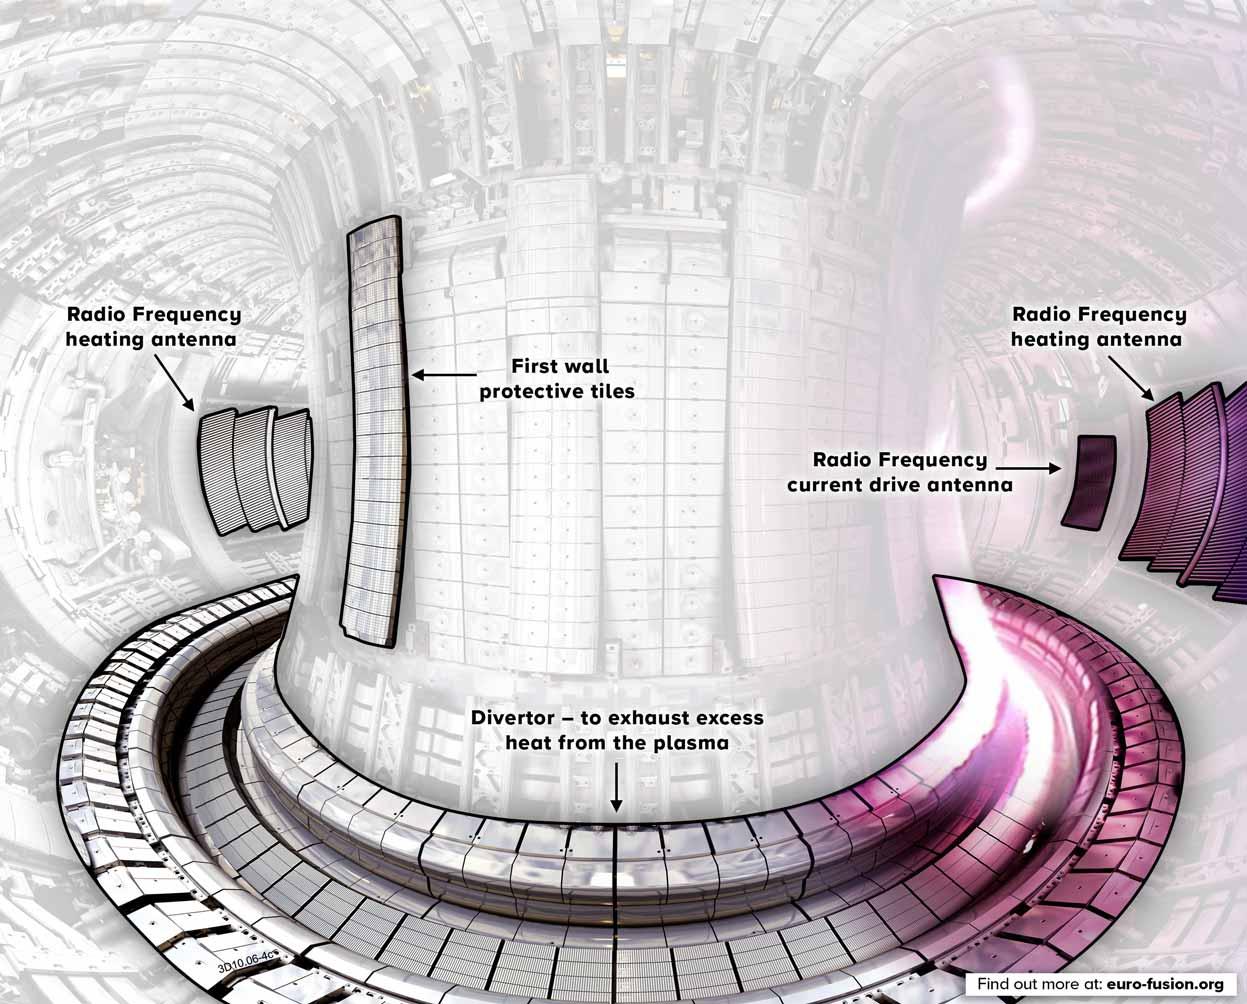 Illustration explaining components inside JET